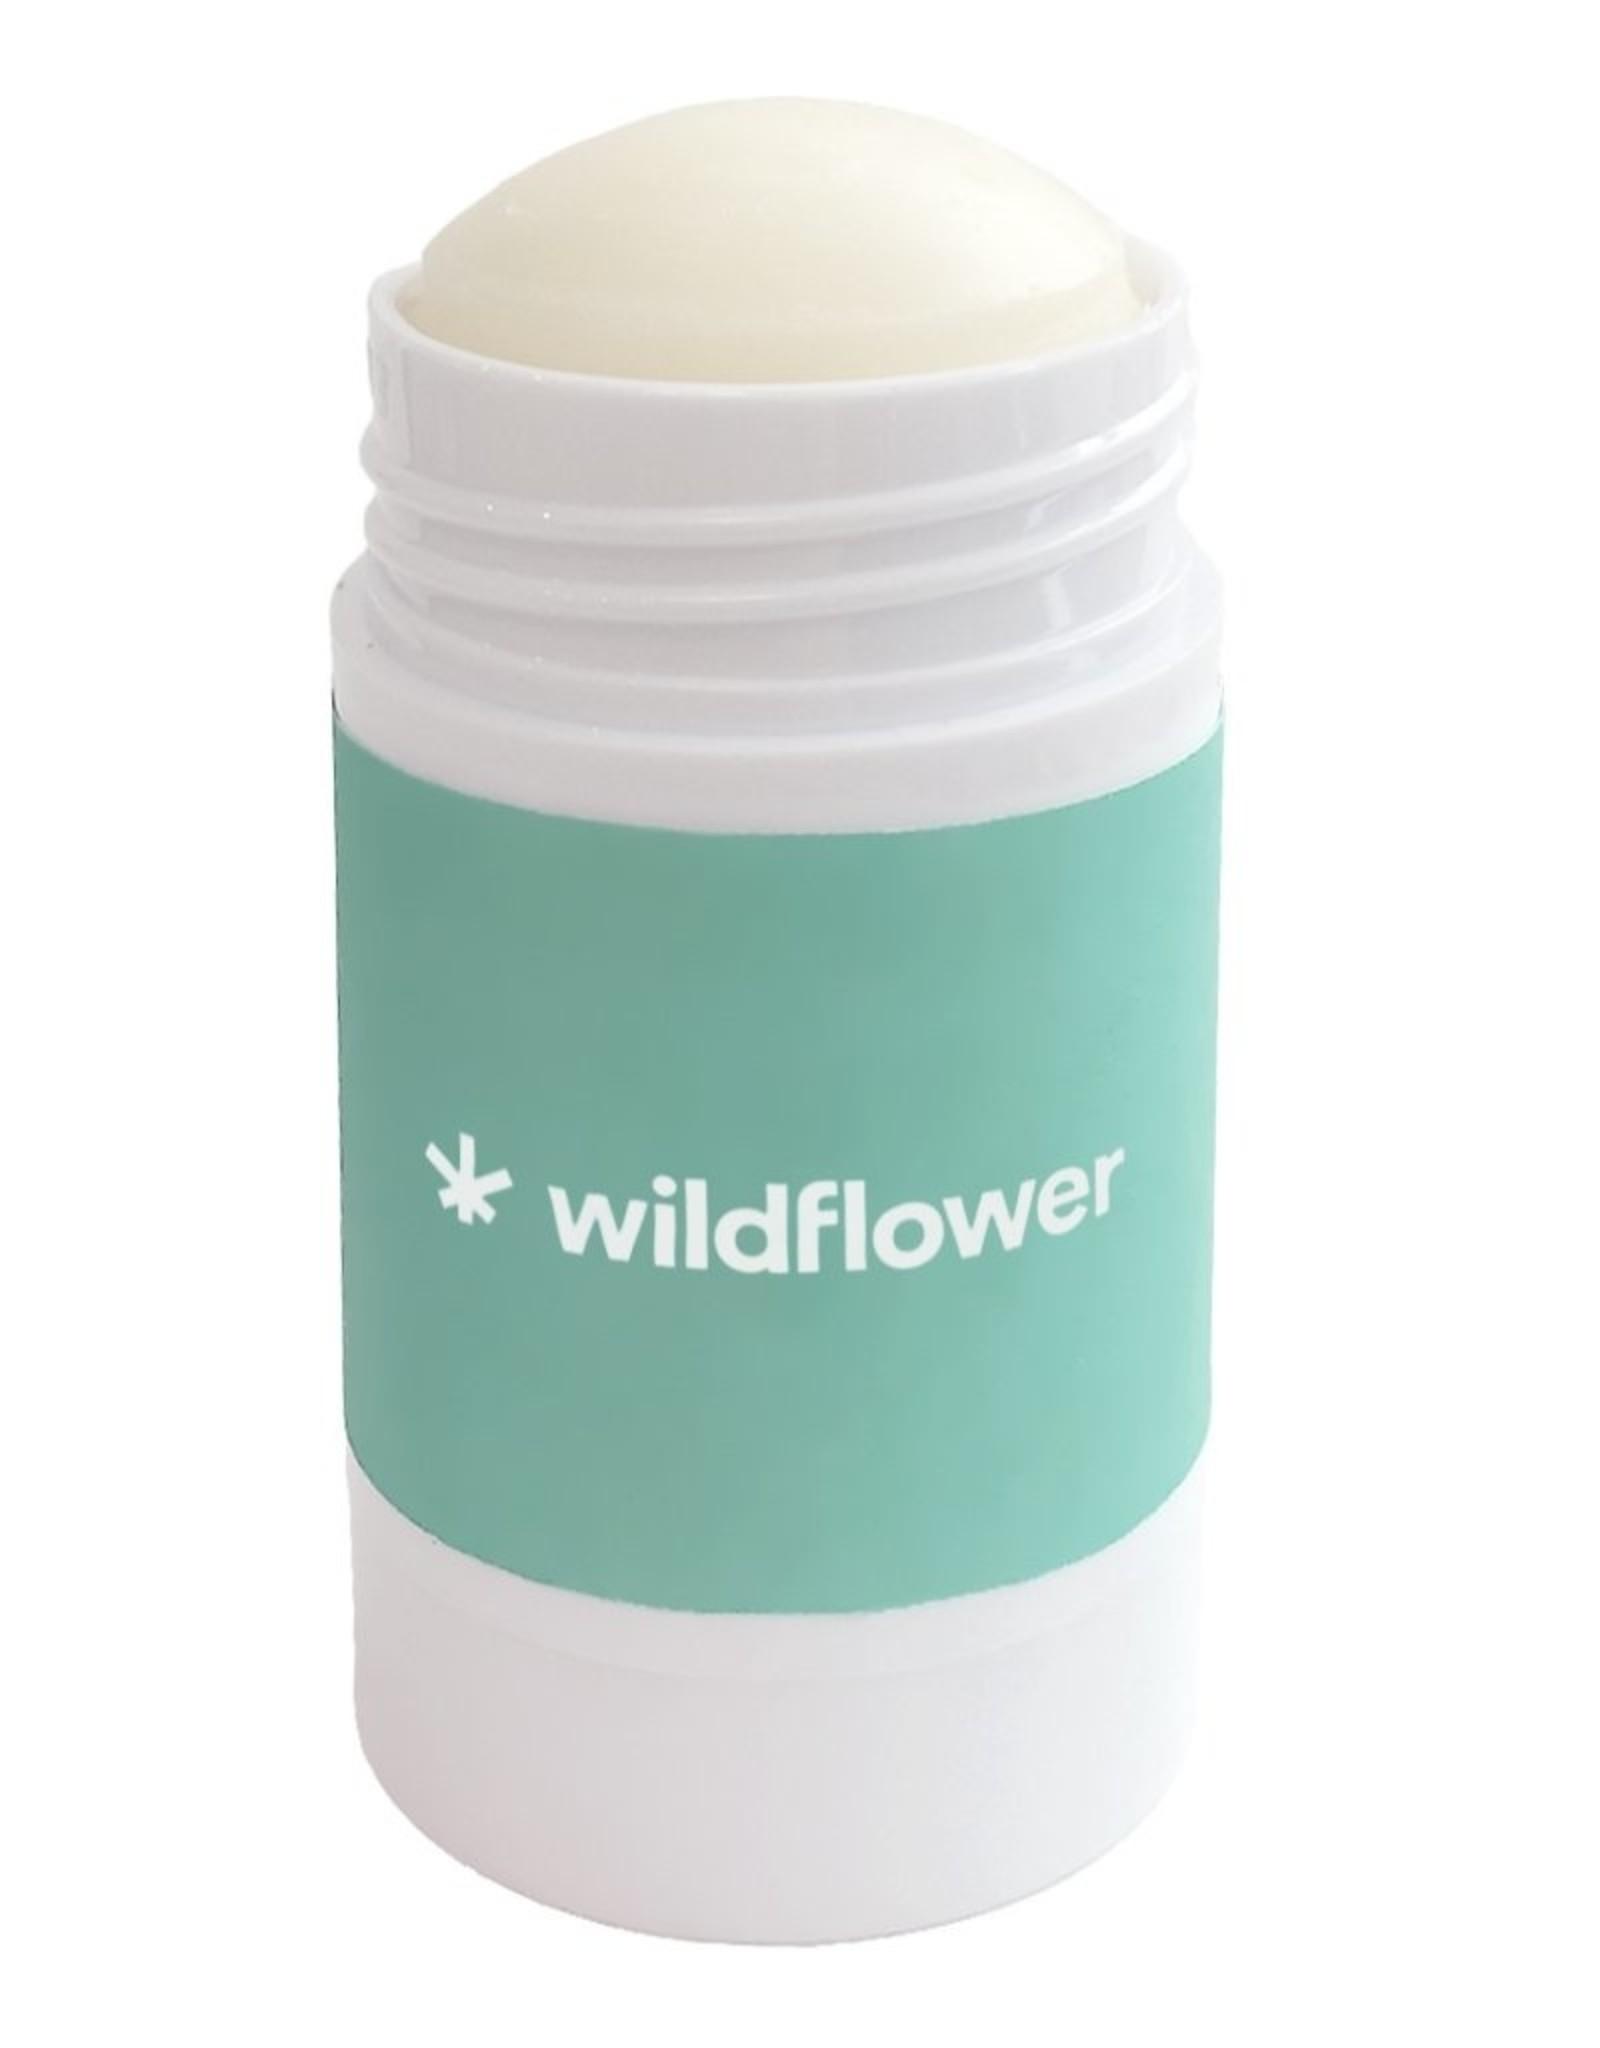 Wildflower Wildflower - CBD Cool Stick